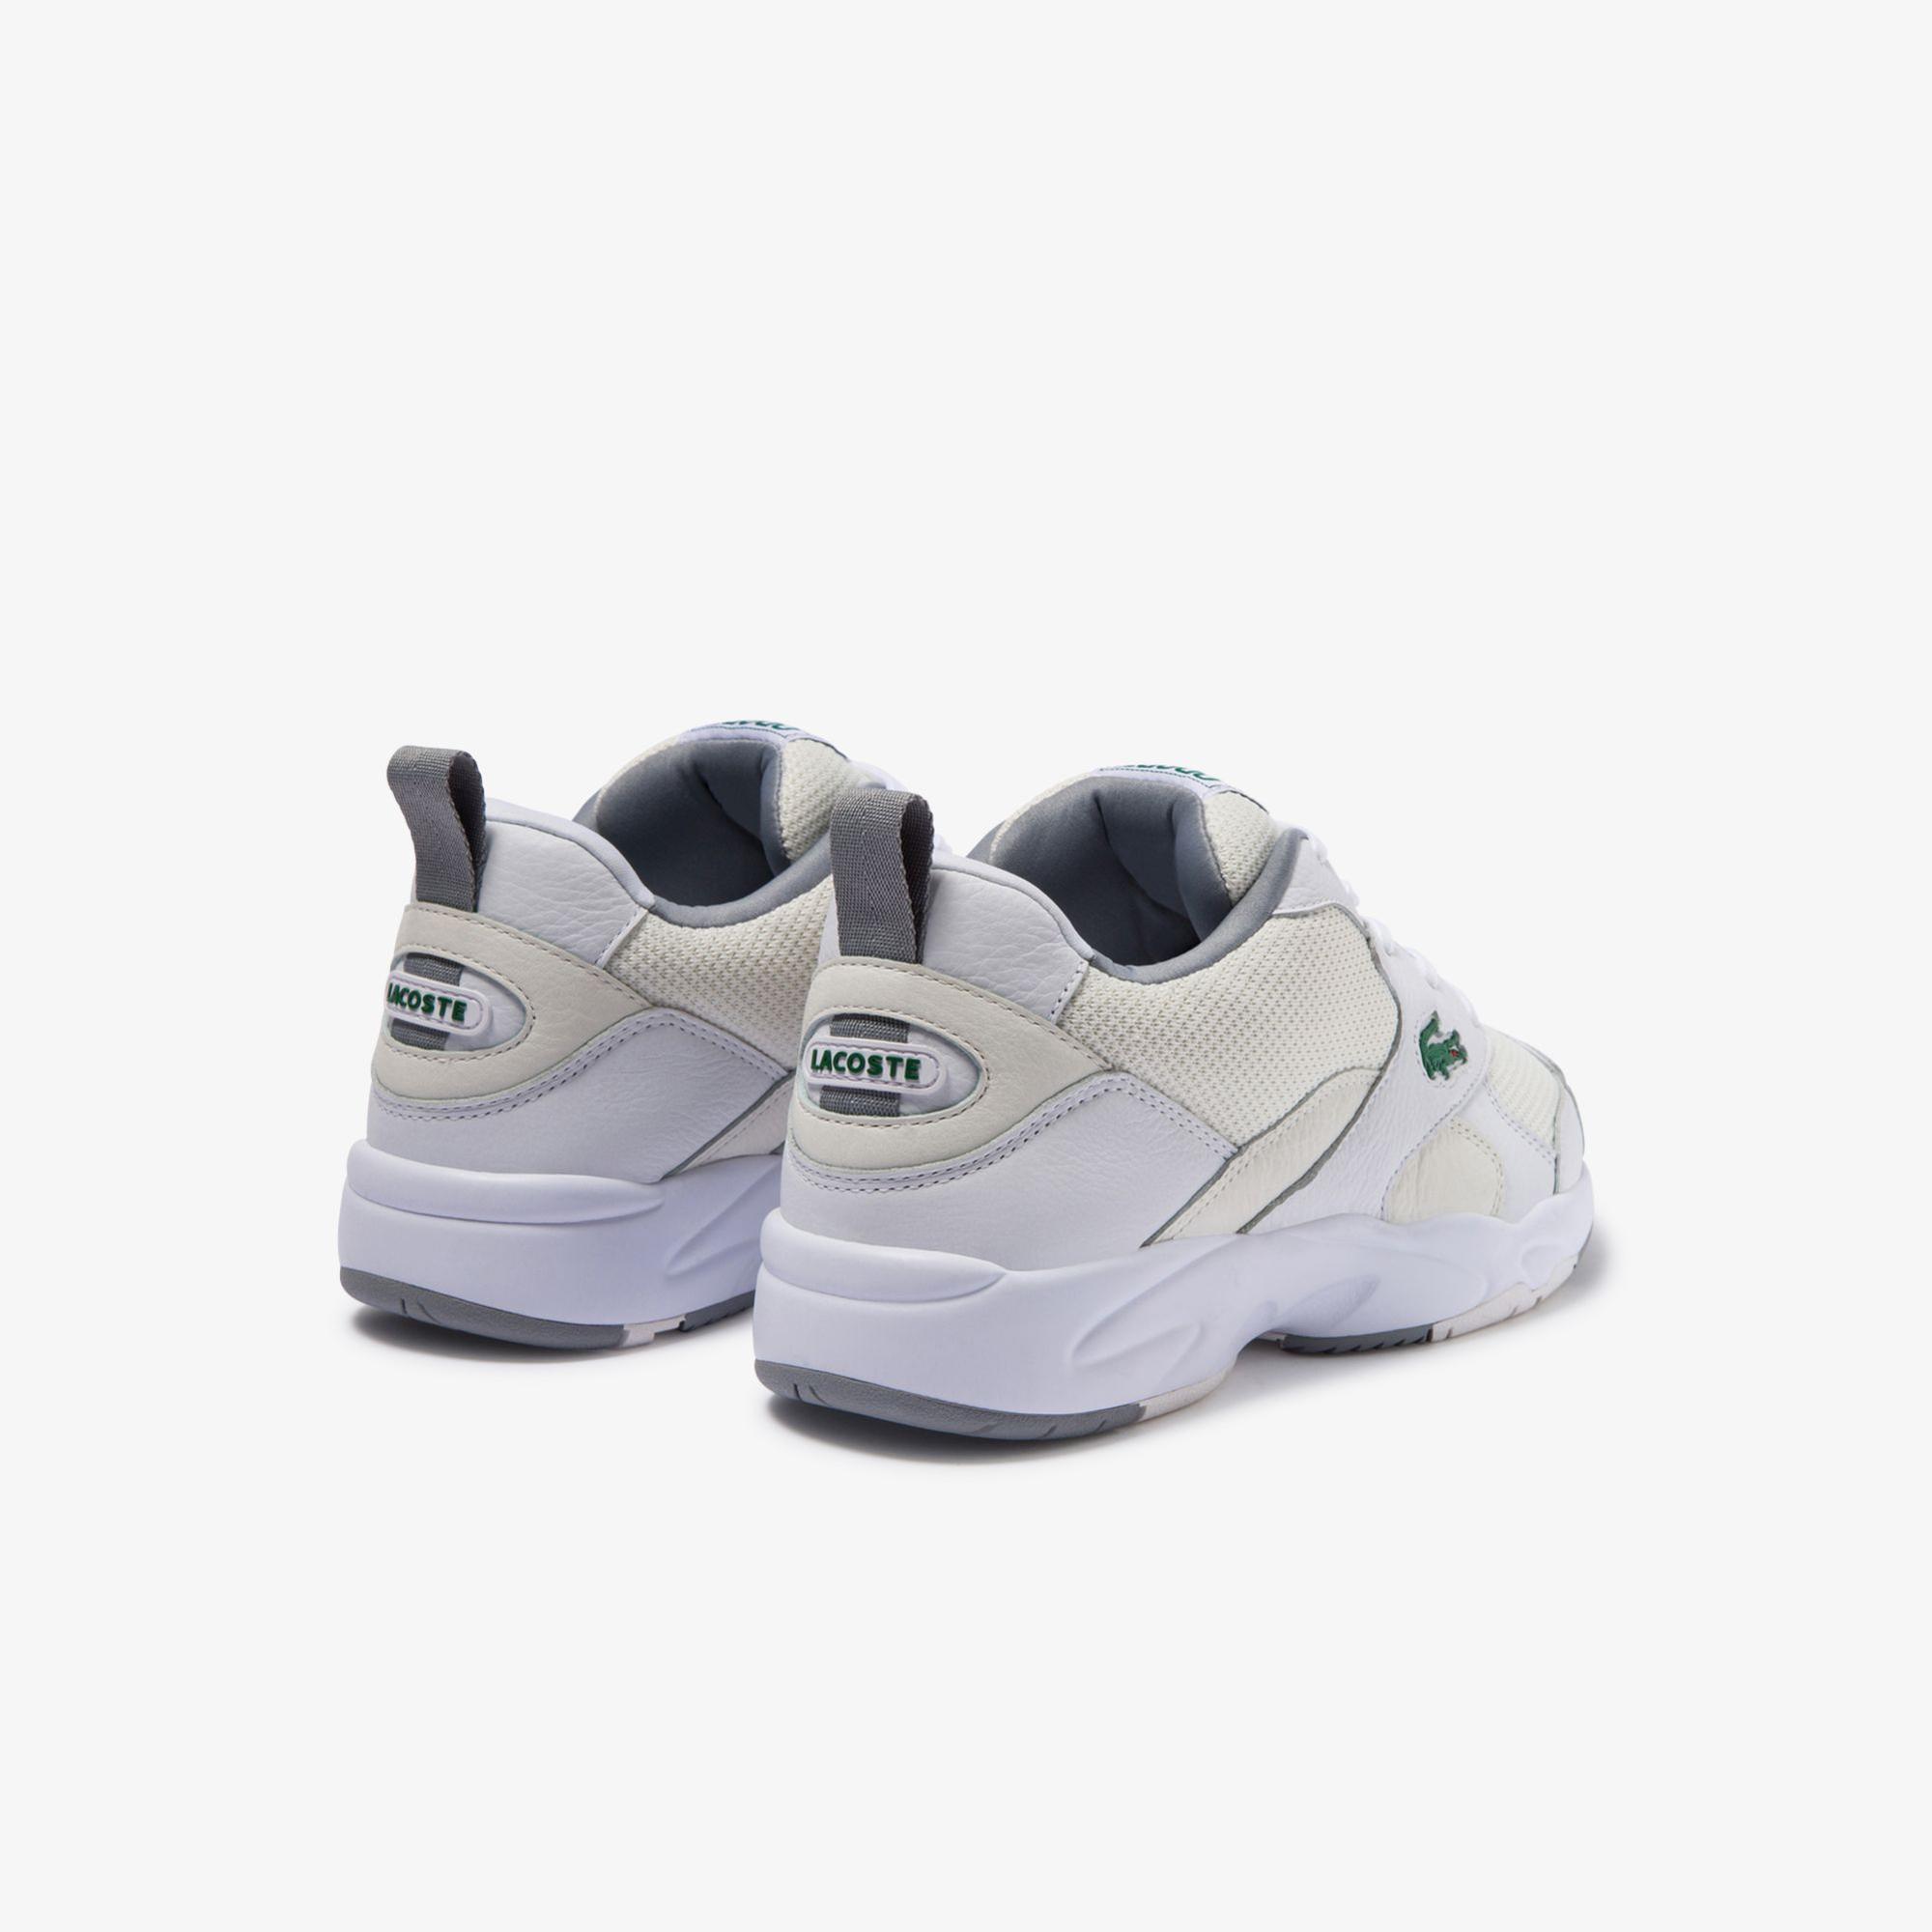 Lacoste Storm 96 120 2 Sma Erkek Beyaz Deri Sneaker